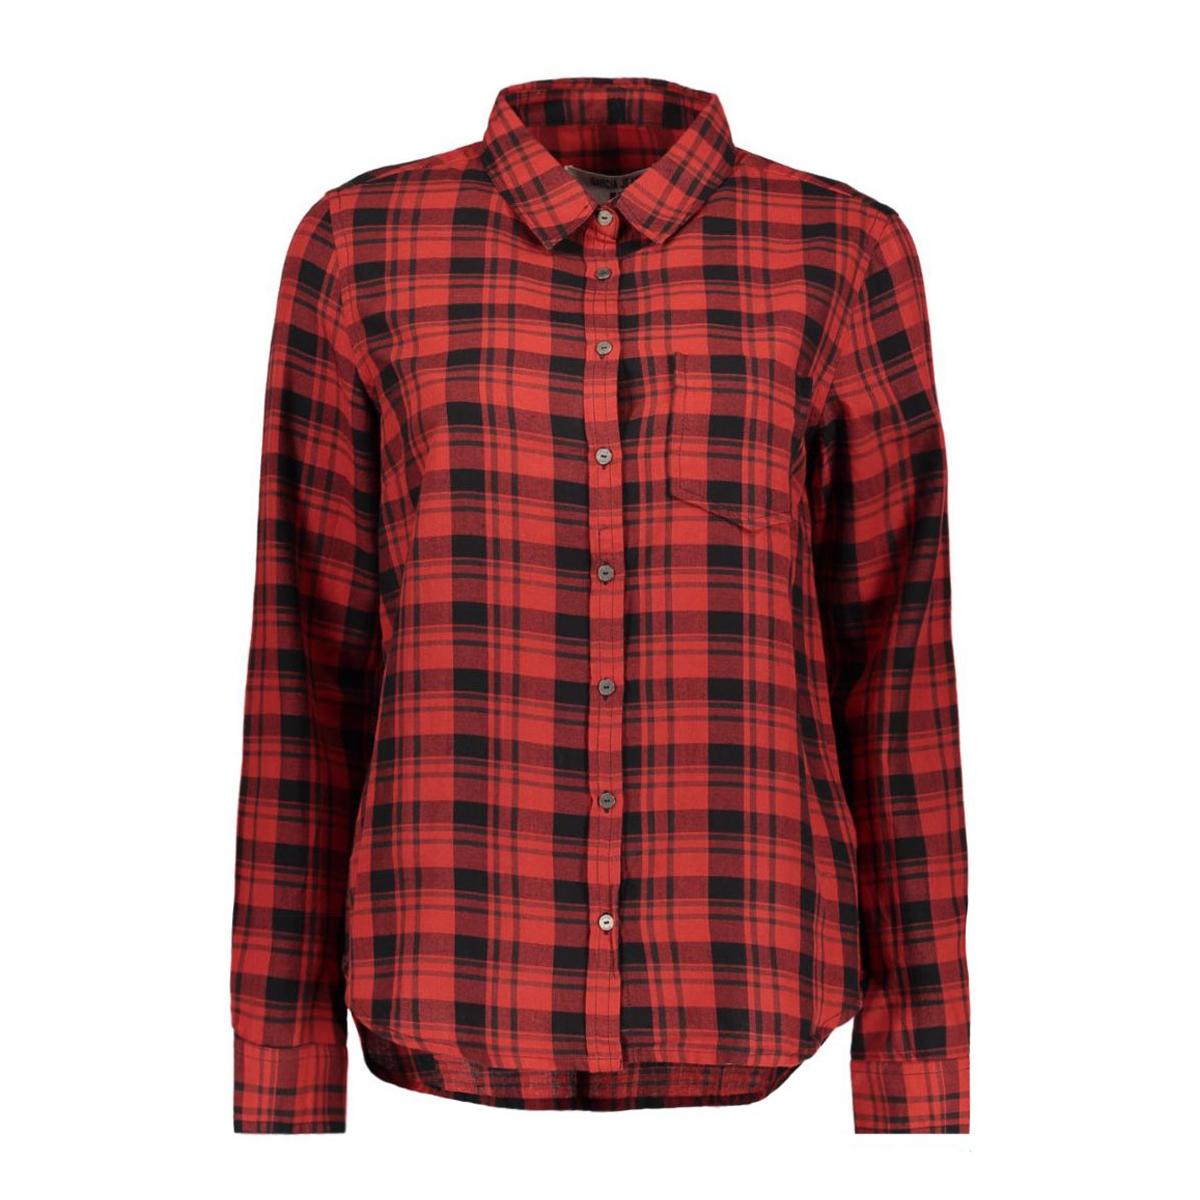 v60238 garcia blouse 2051 brique